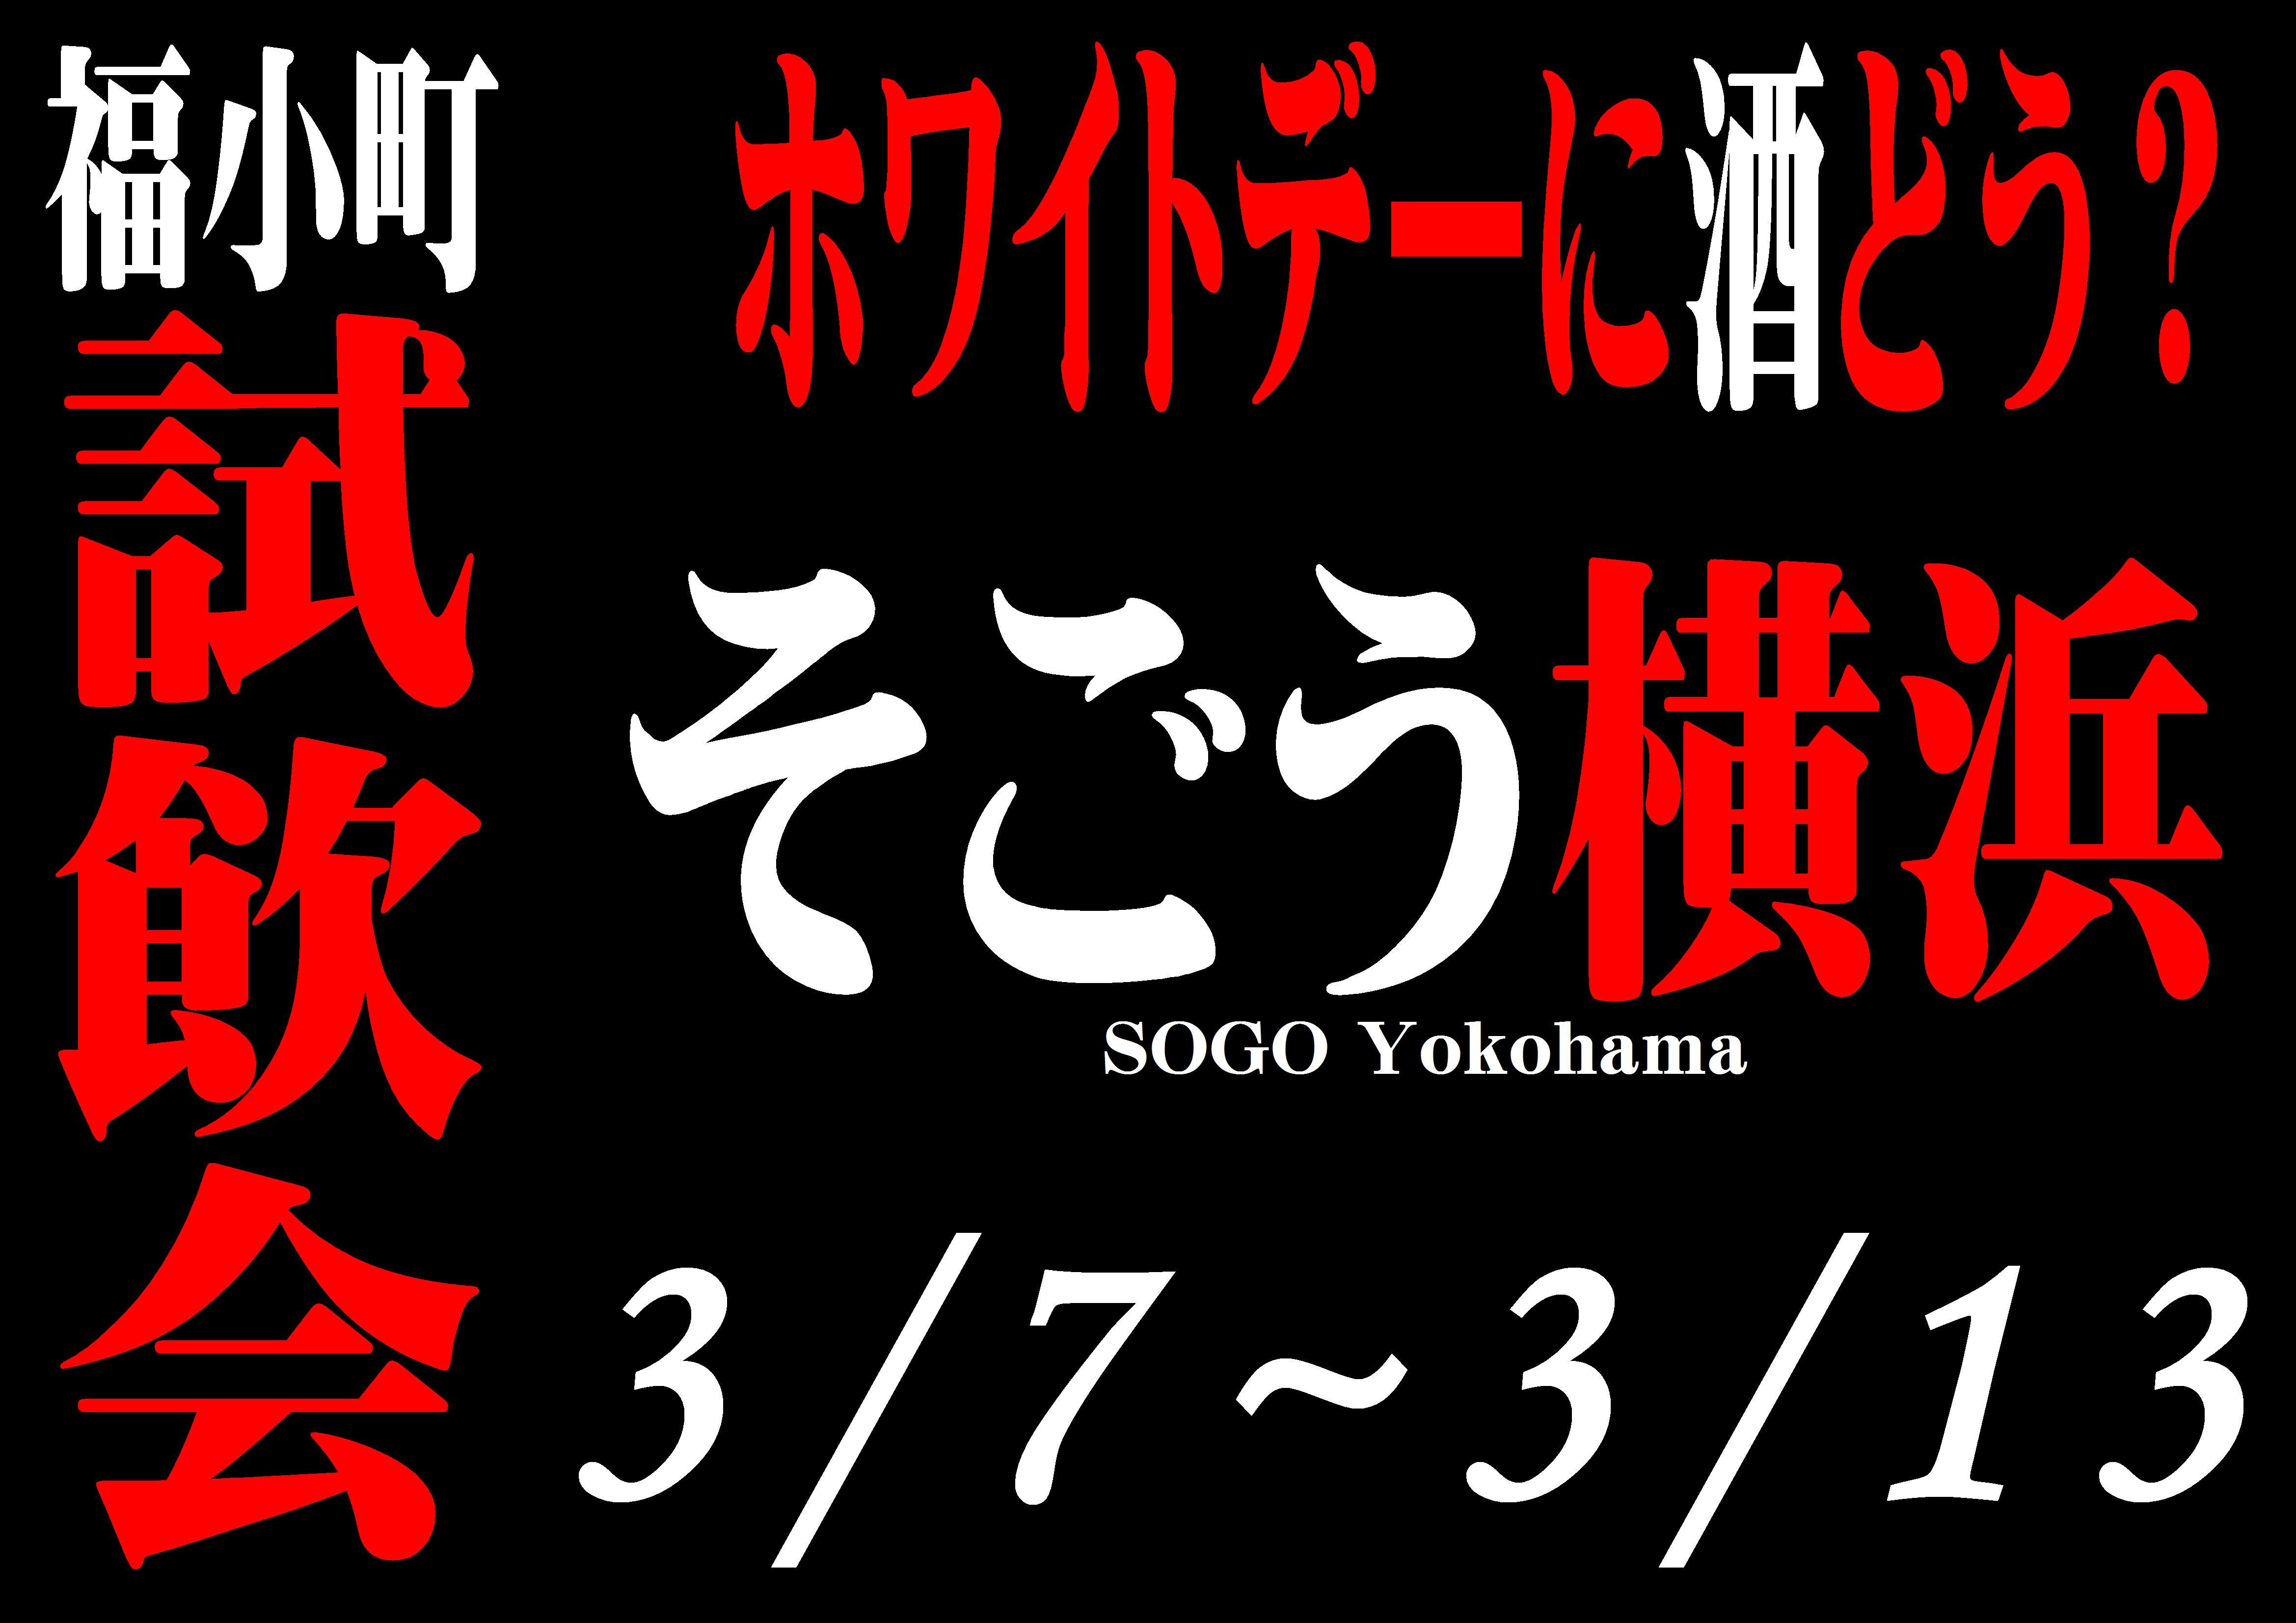 http://www.fukukomachi.com/blog/photo/20170307.JPG